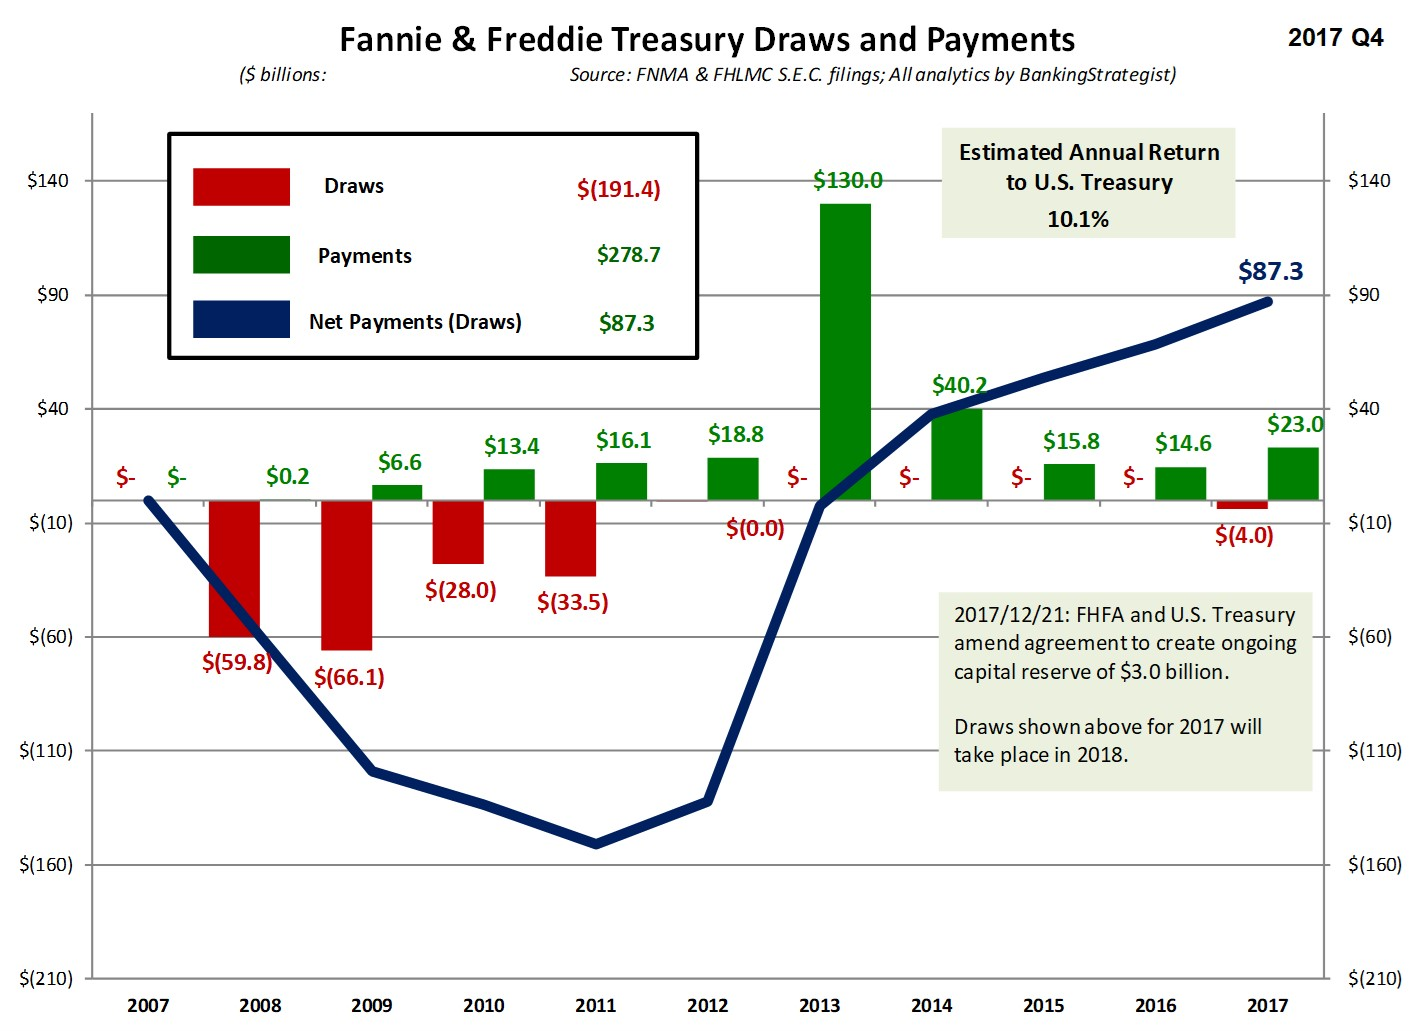 FNMA_FHLMC_Treasury_Draws_Payments.jpg